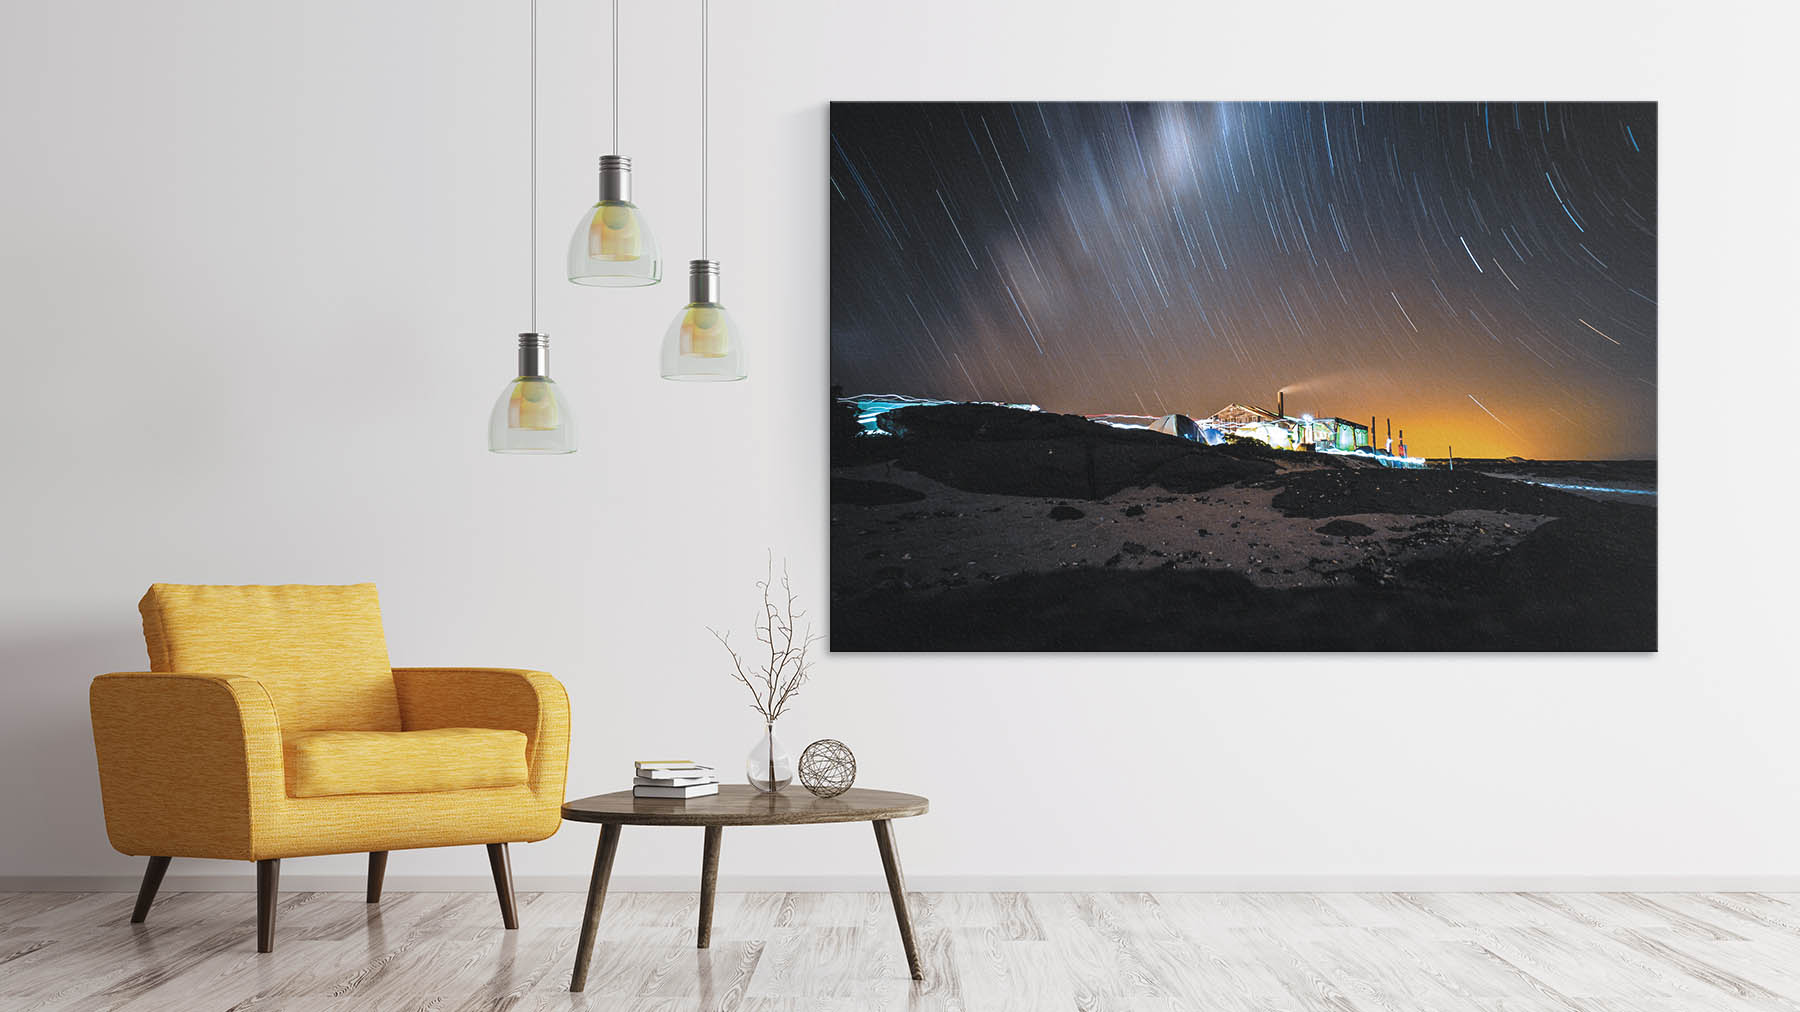 Real Estate Photo Using Adobe Photoshop CC